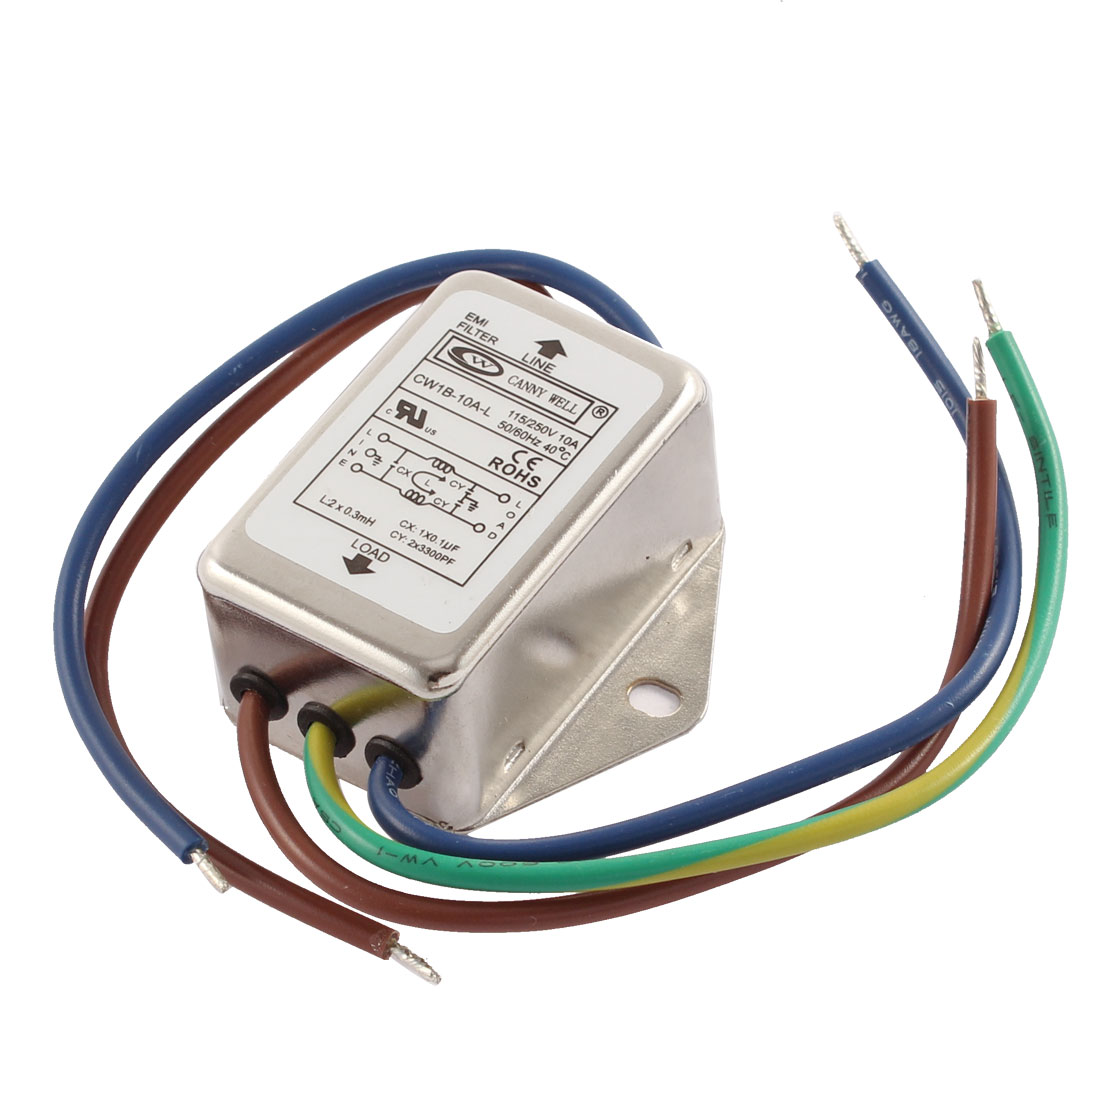 AC 115/250V 10A CW1B-10A-L Noise Suppressor Power EMI Filter